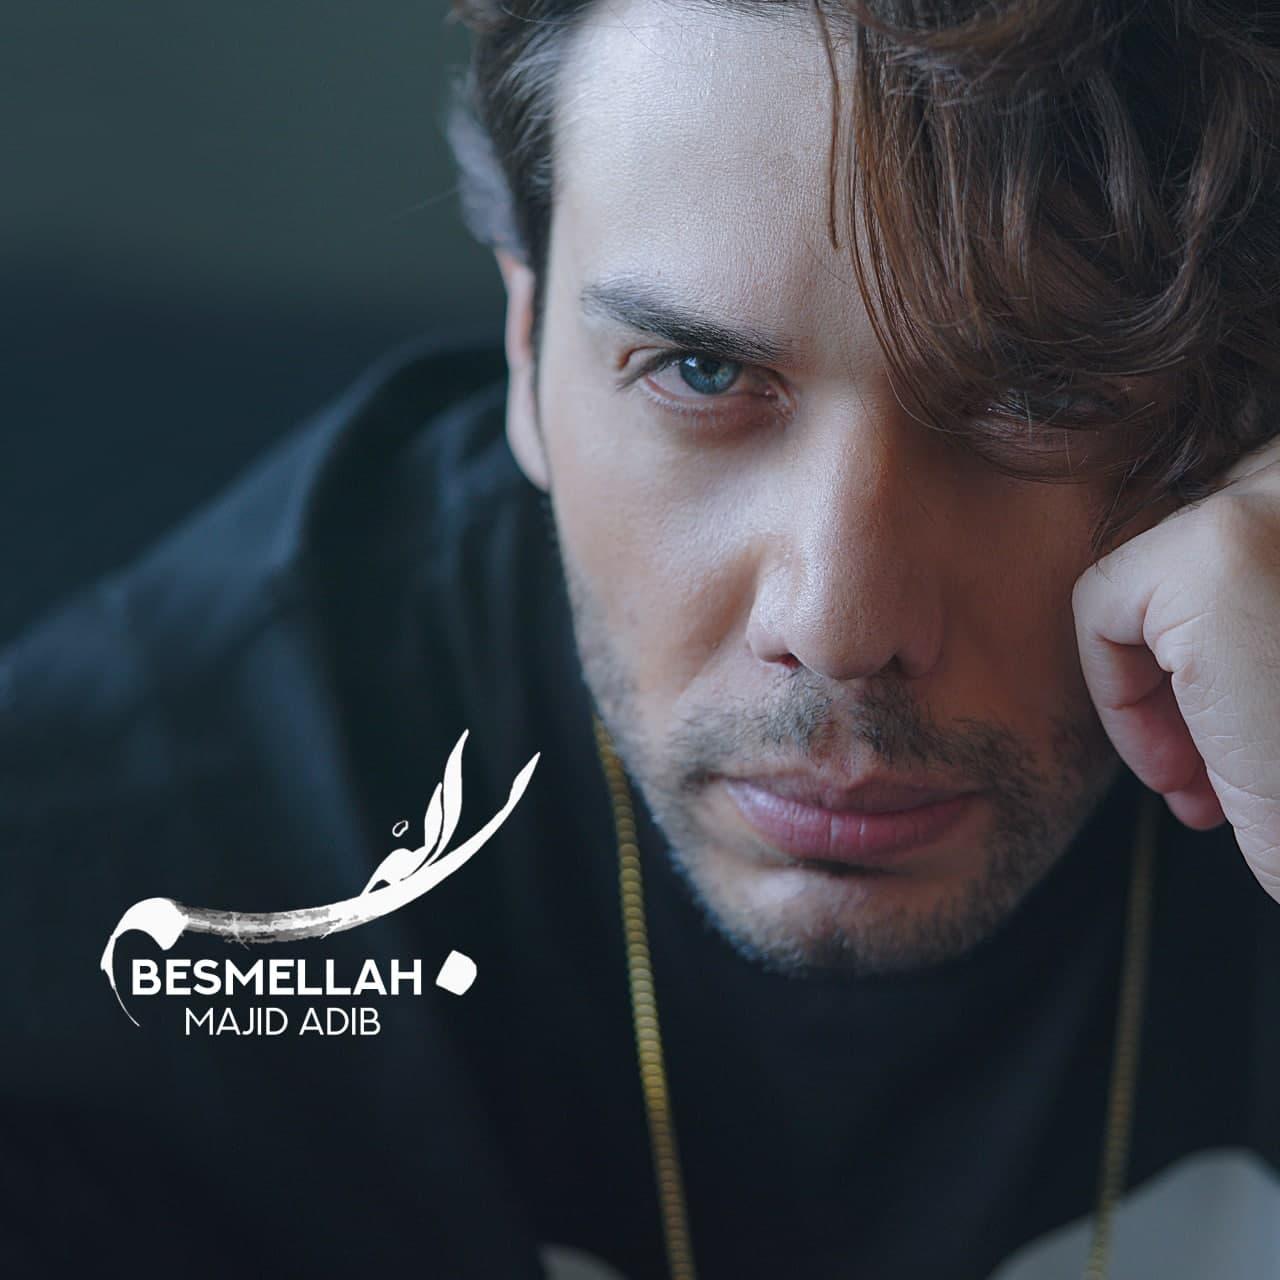 دانلود آلبوم جدید مجید ادیب بنام بسم الله